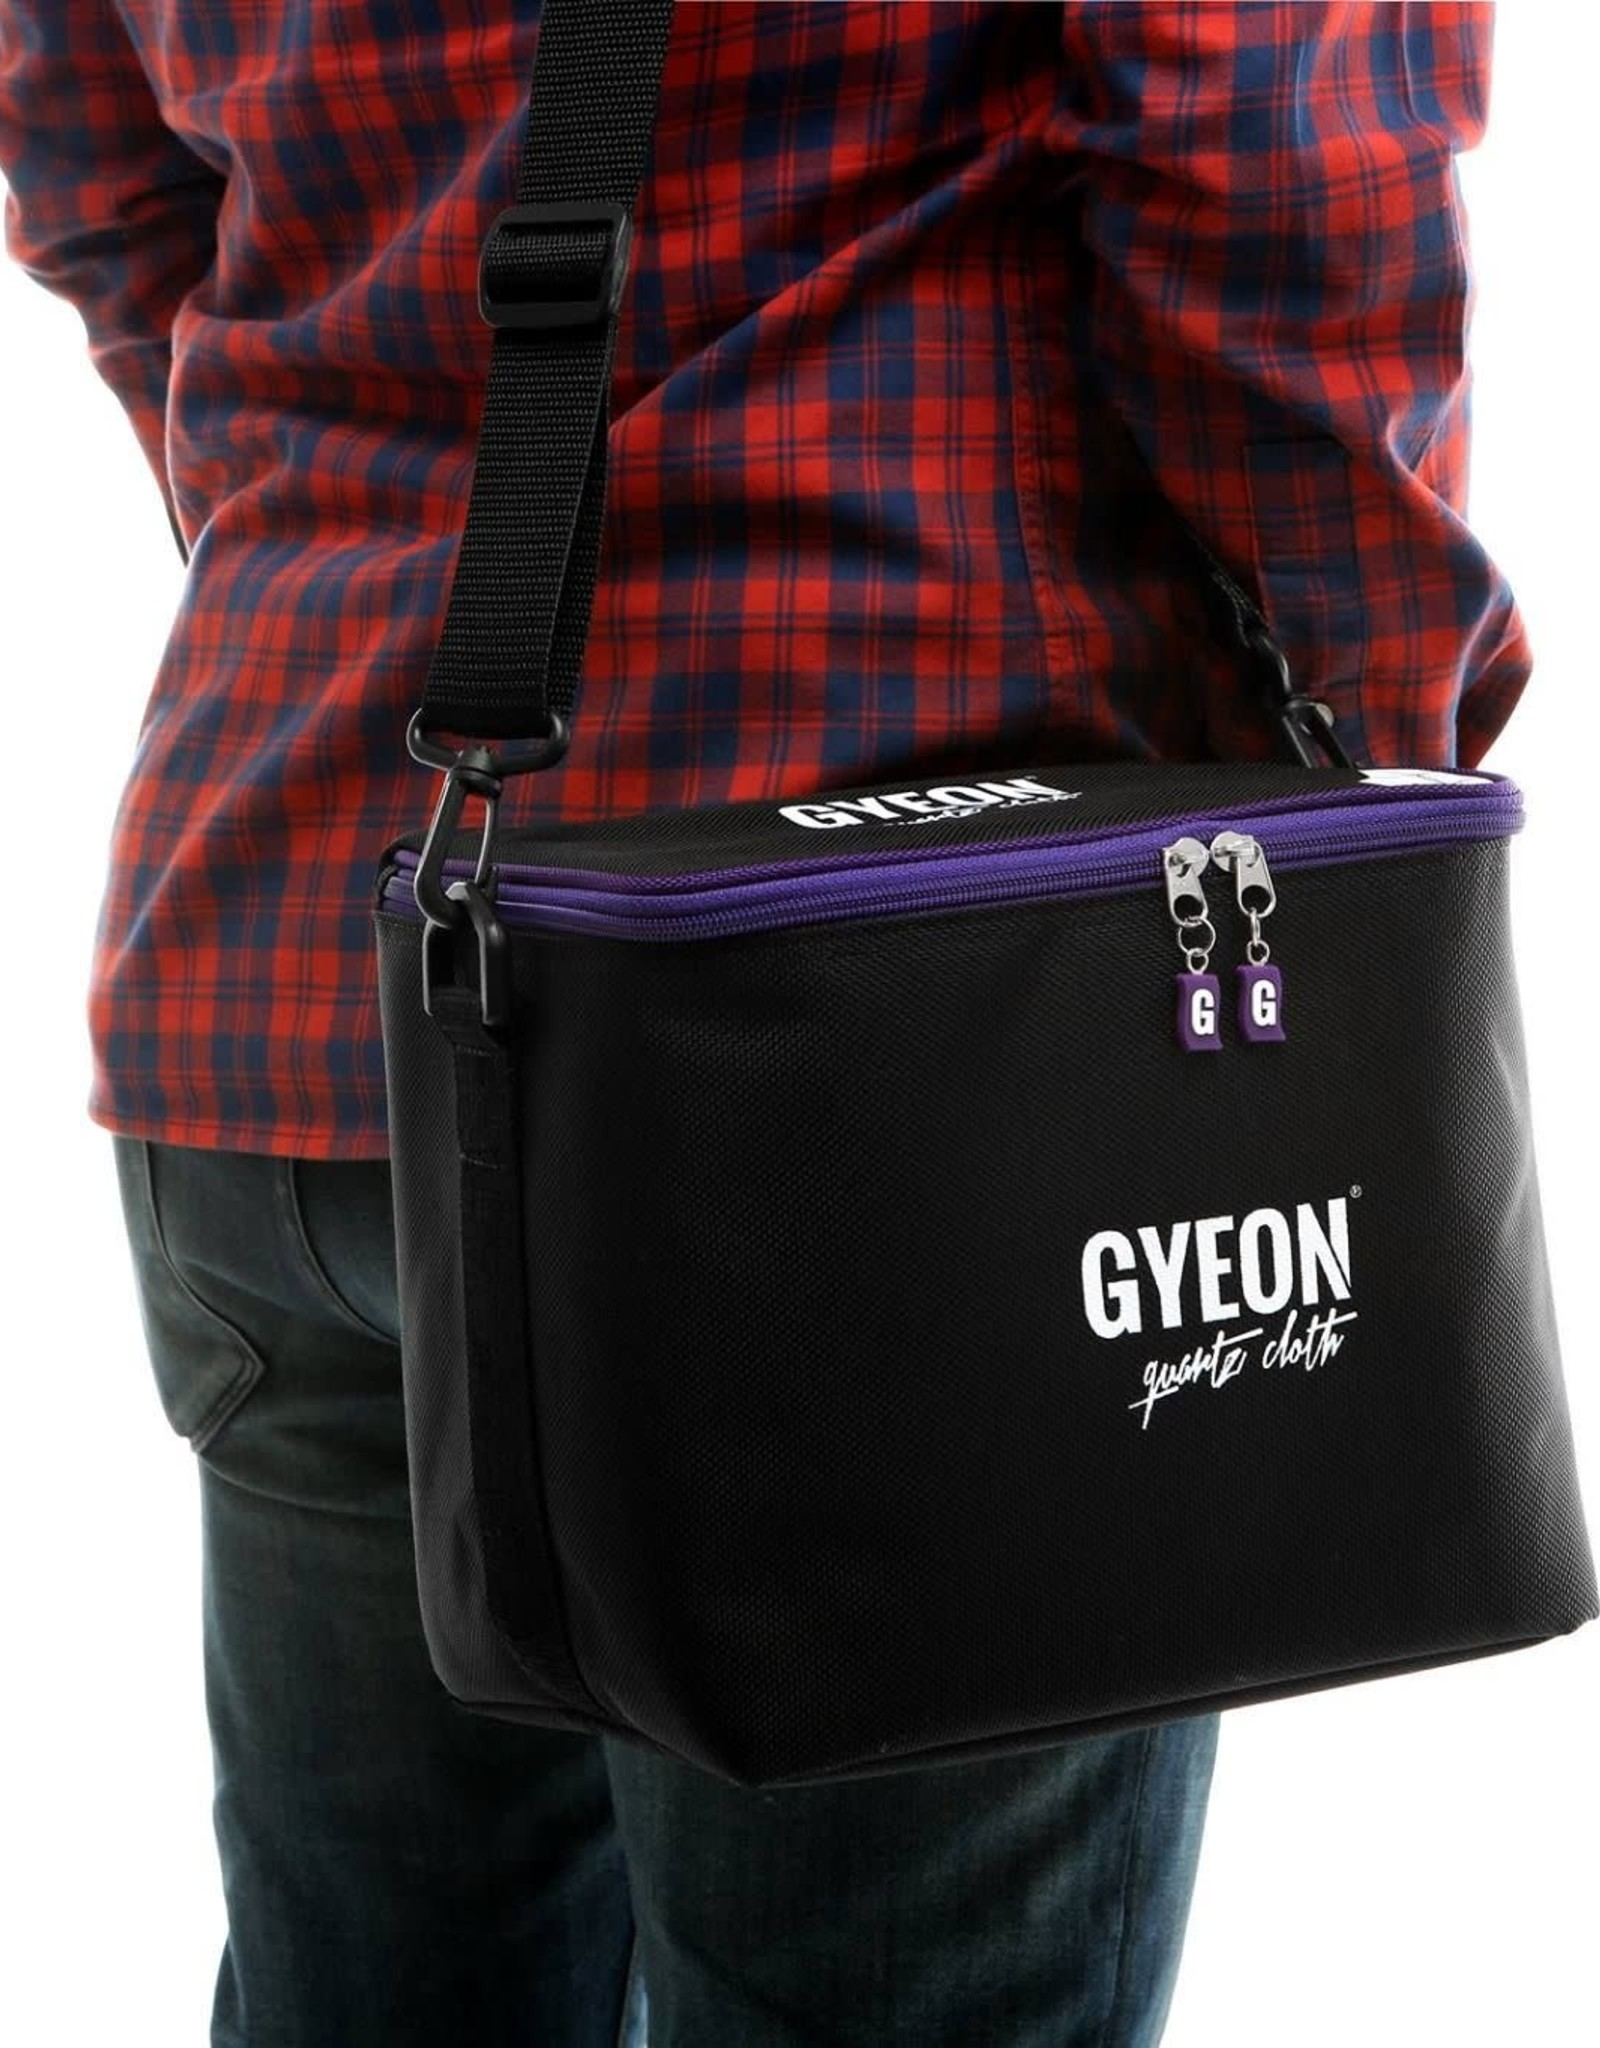 Gyeon Gyeon Q2M Detail Bag small